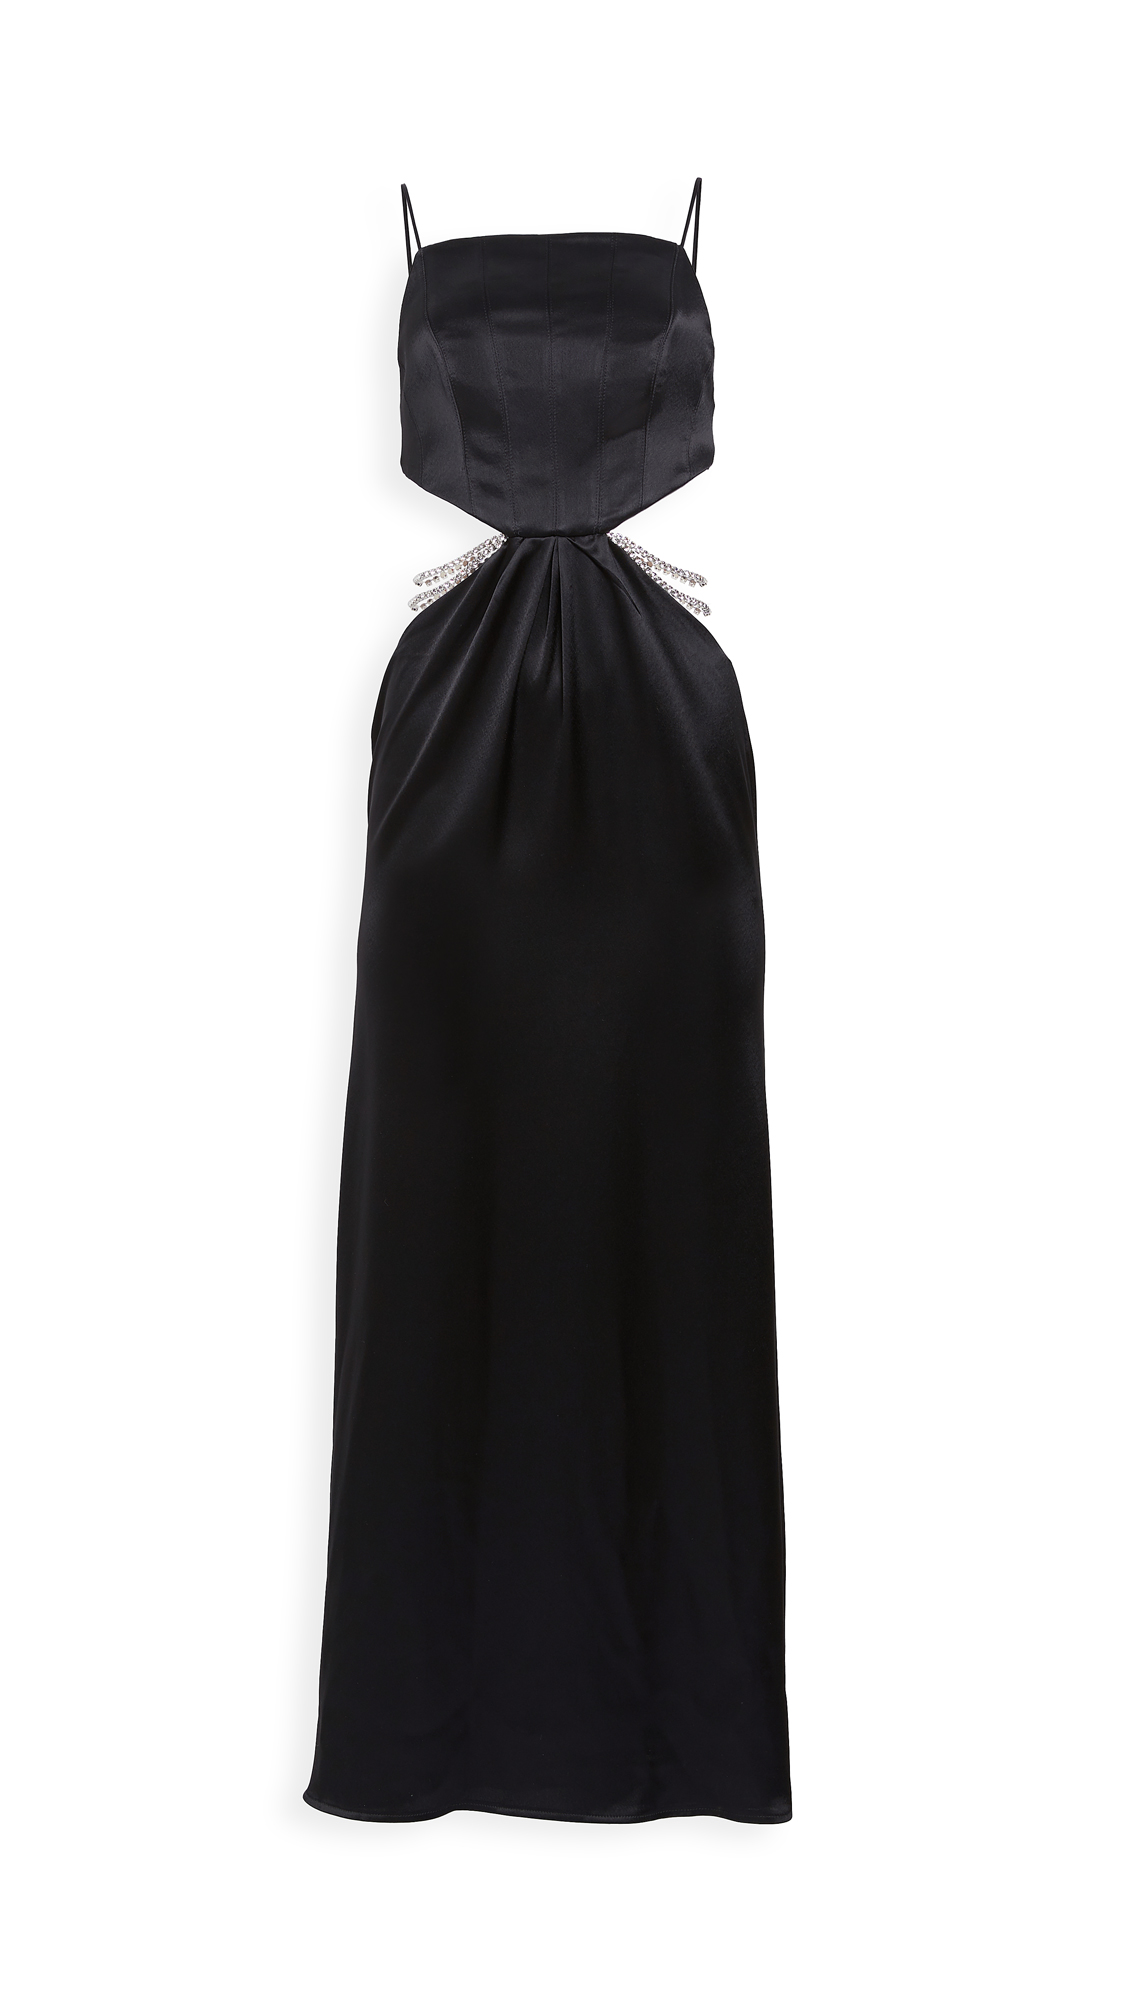 Photo of Nafsika Skourti Carla Dress Long - shop Nafsika Skourti Dresses, Strapless online